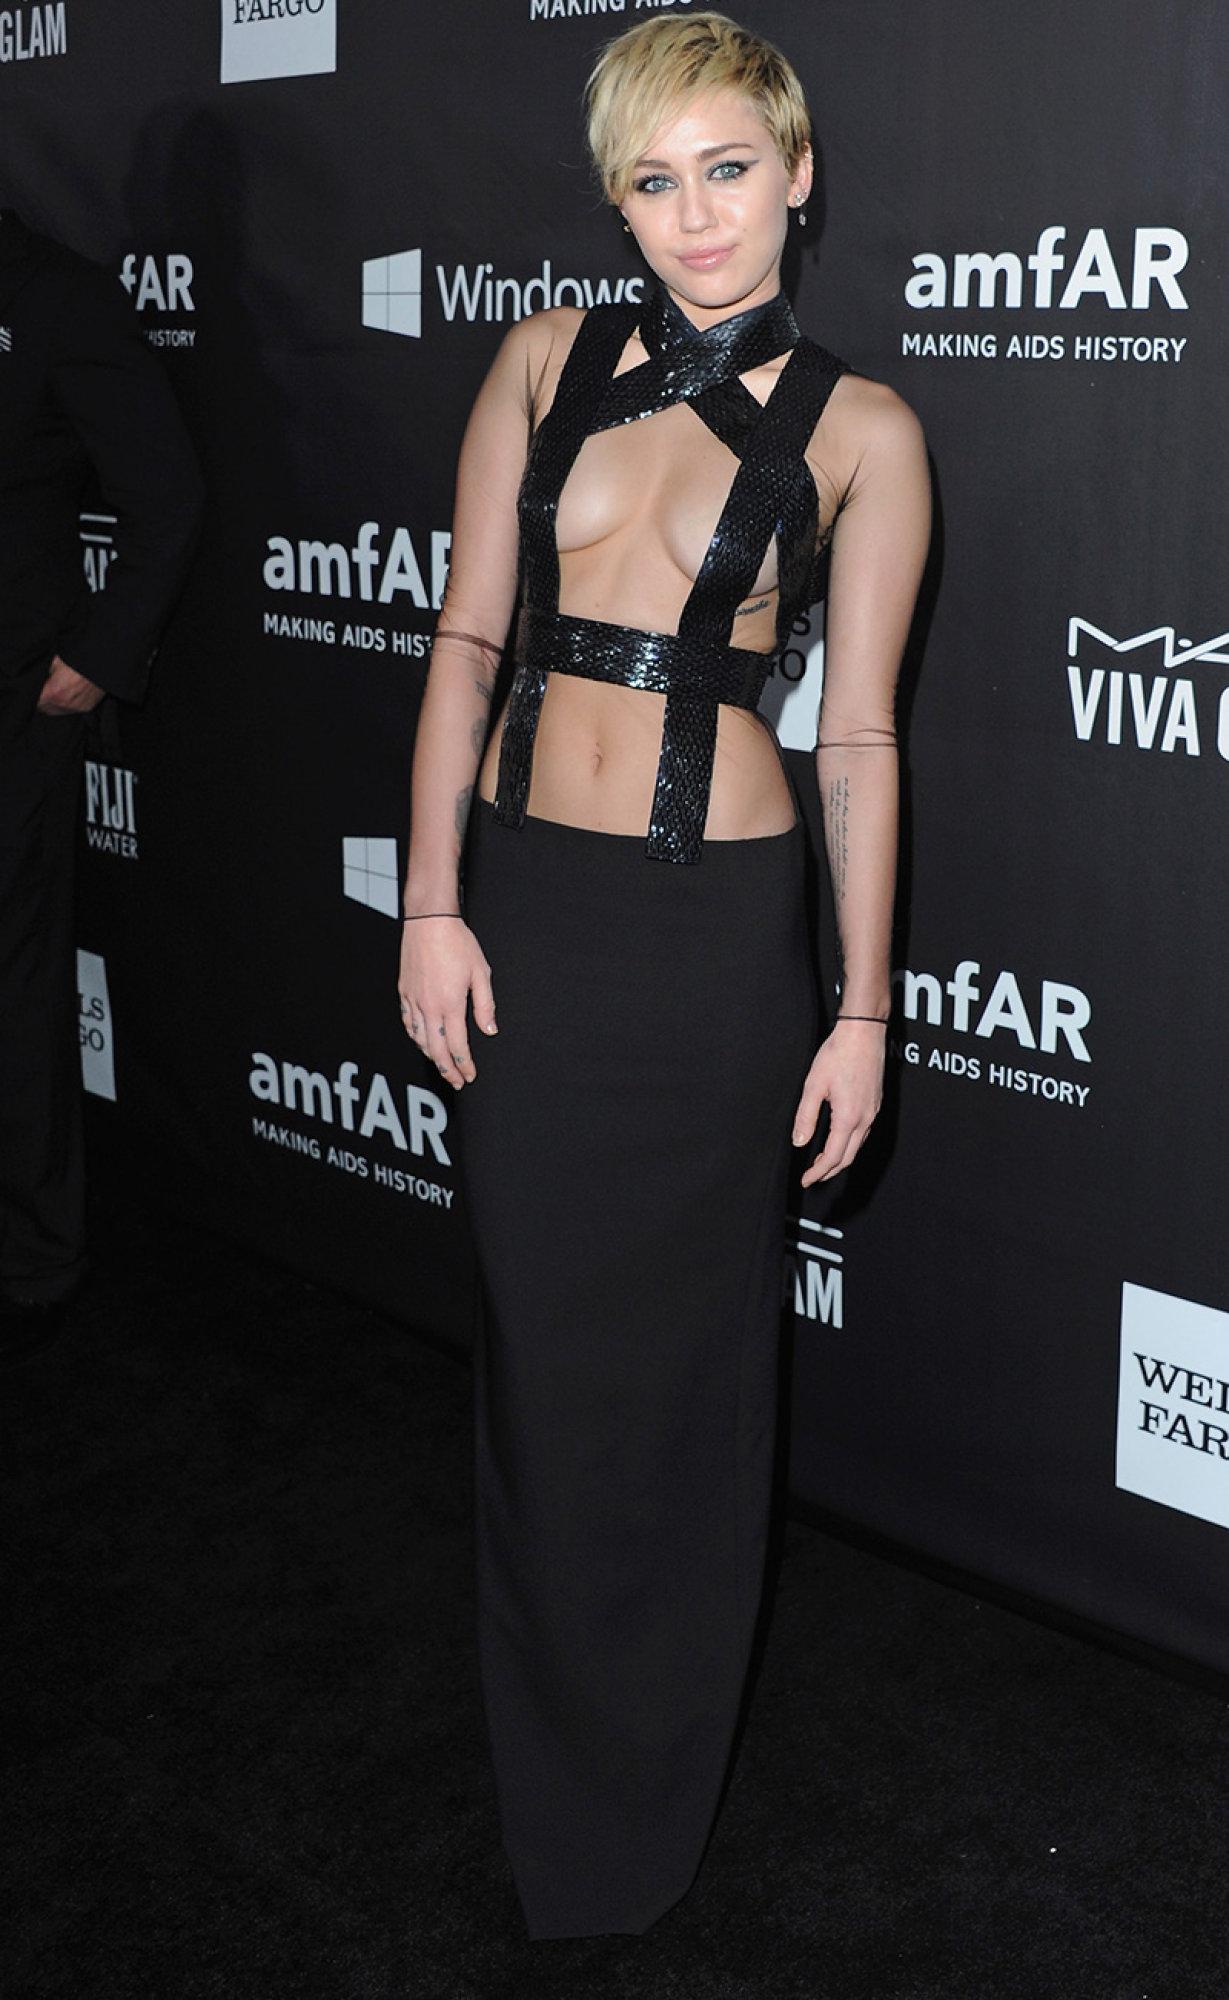 Miley Cyrus & Bondage Chic